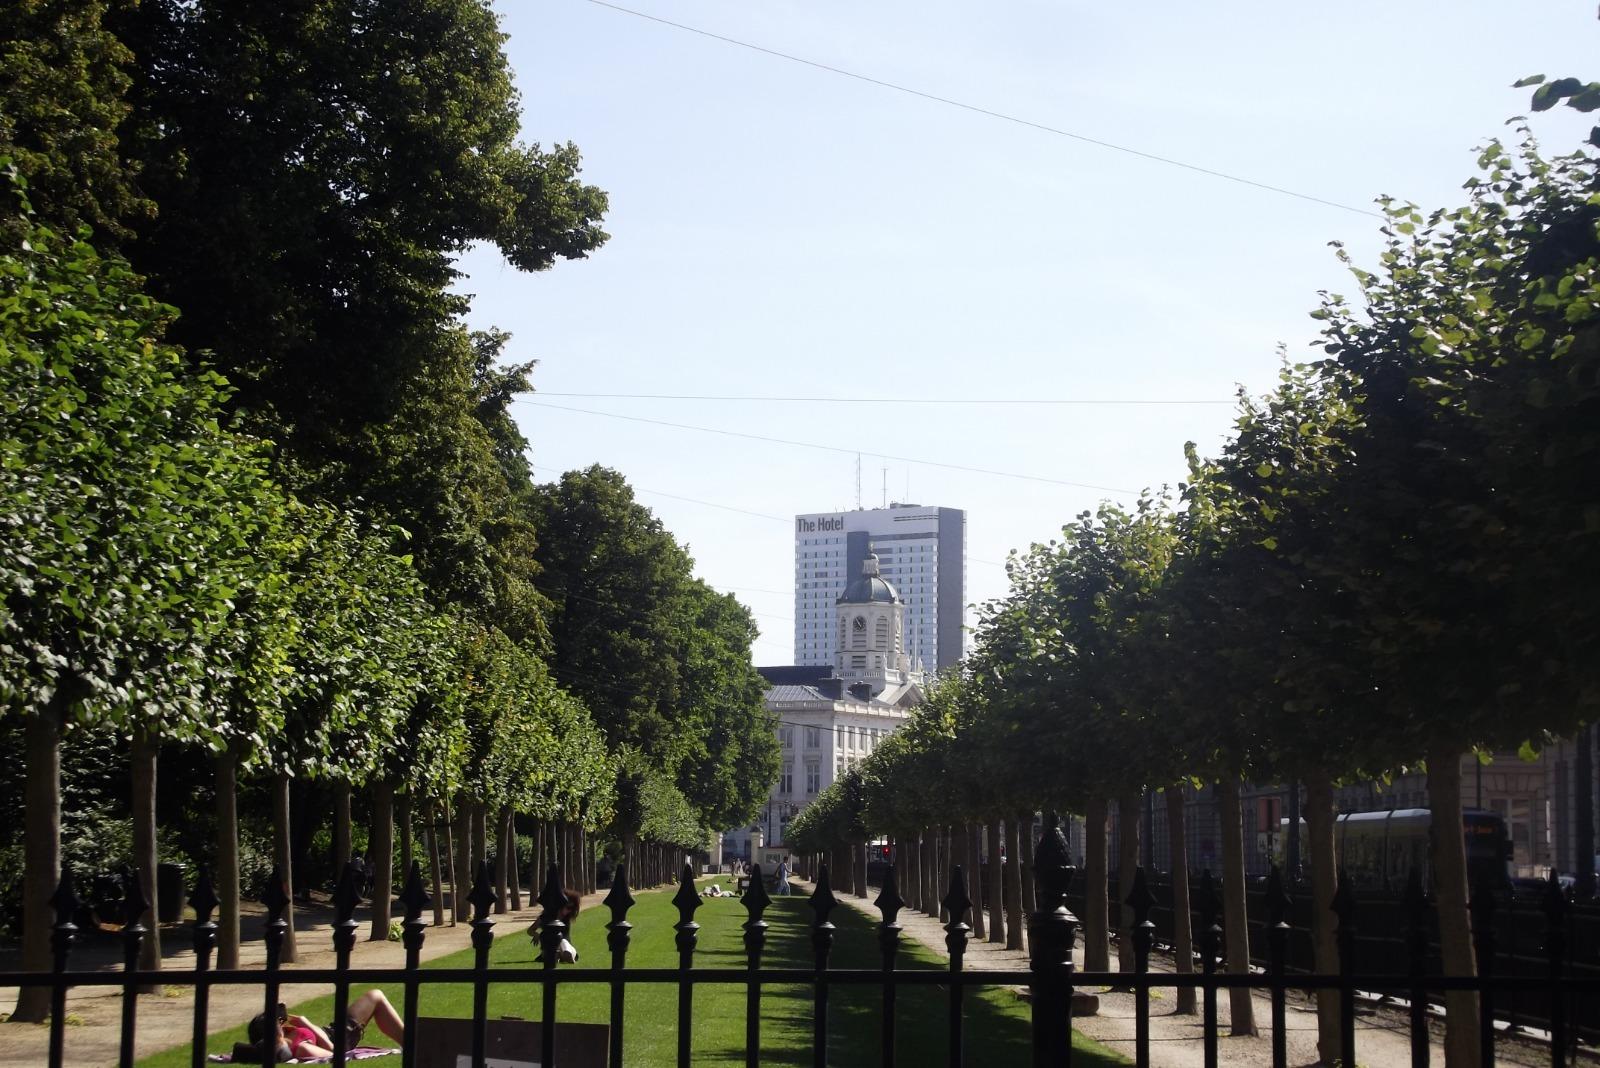 belgioelussemburgo18-1600418824.jpg